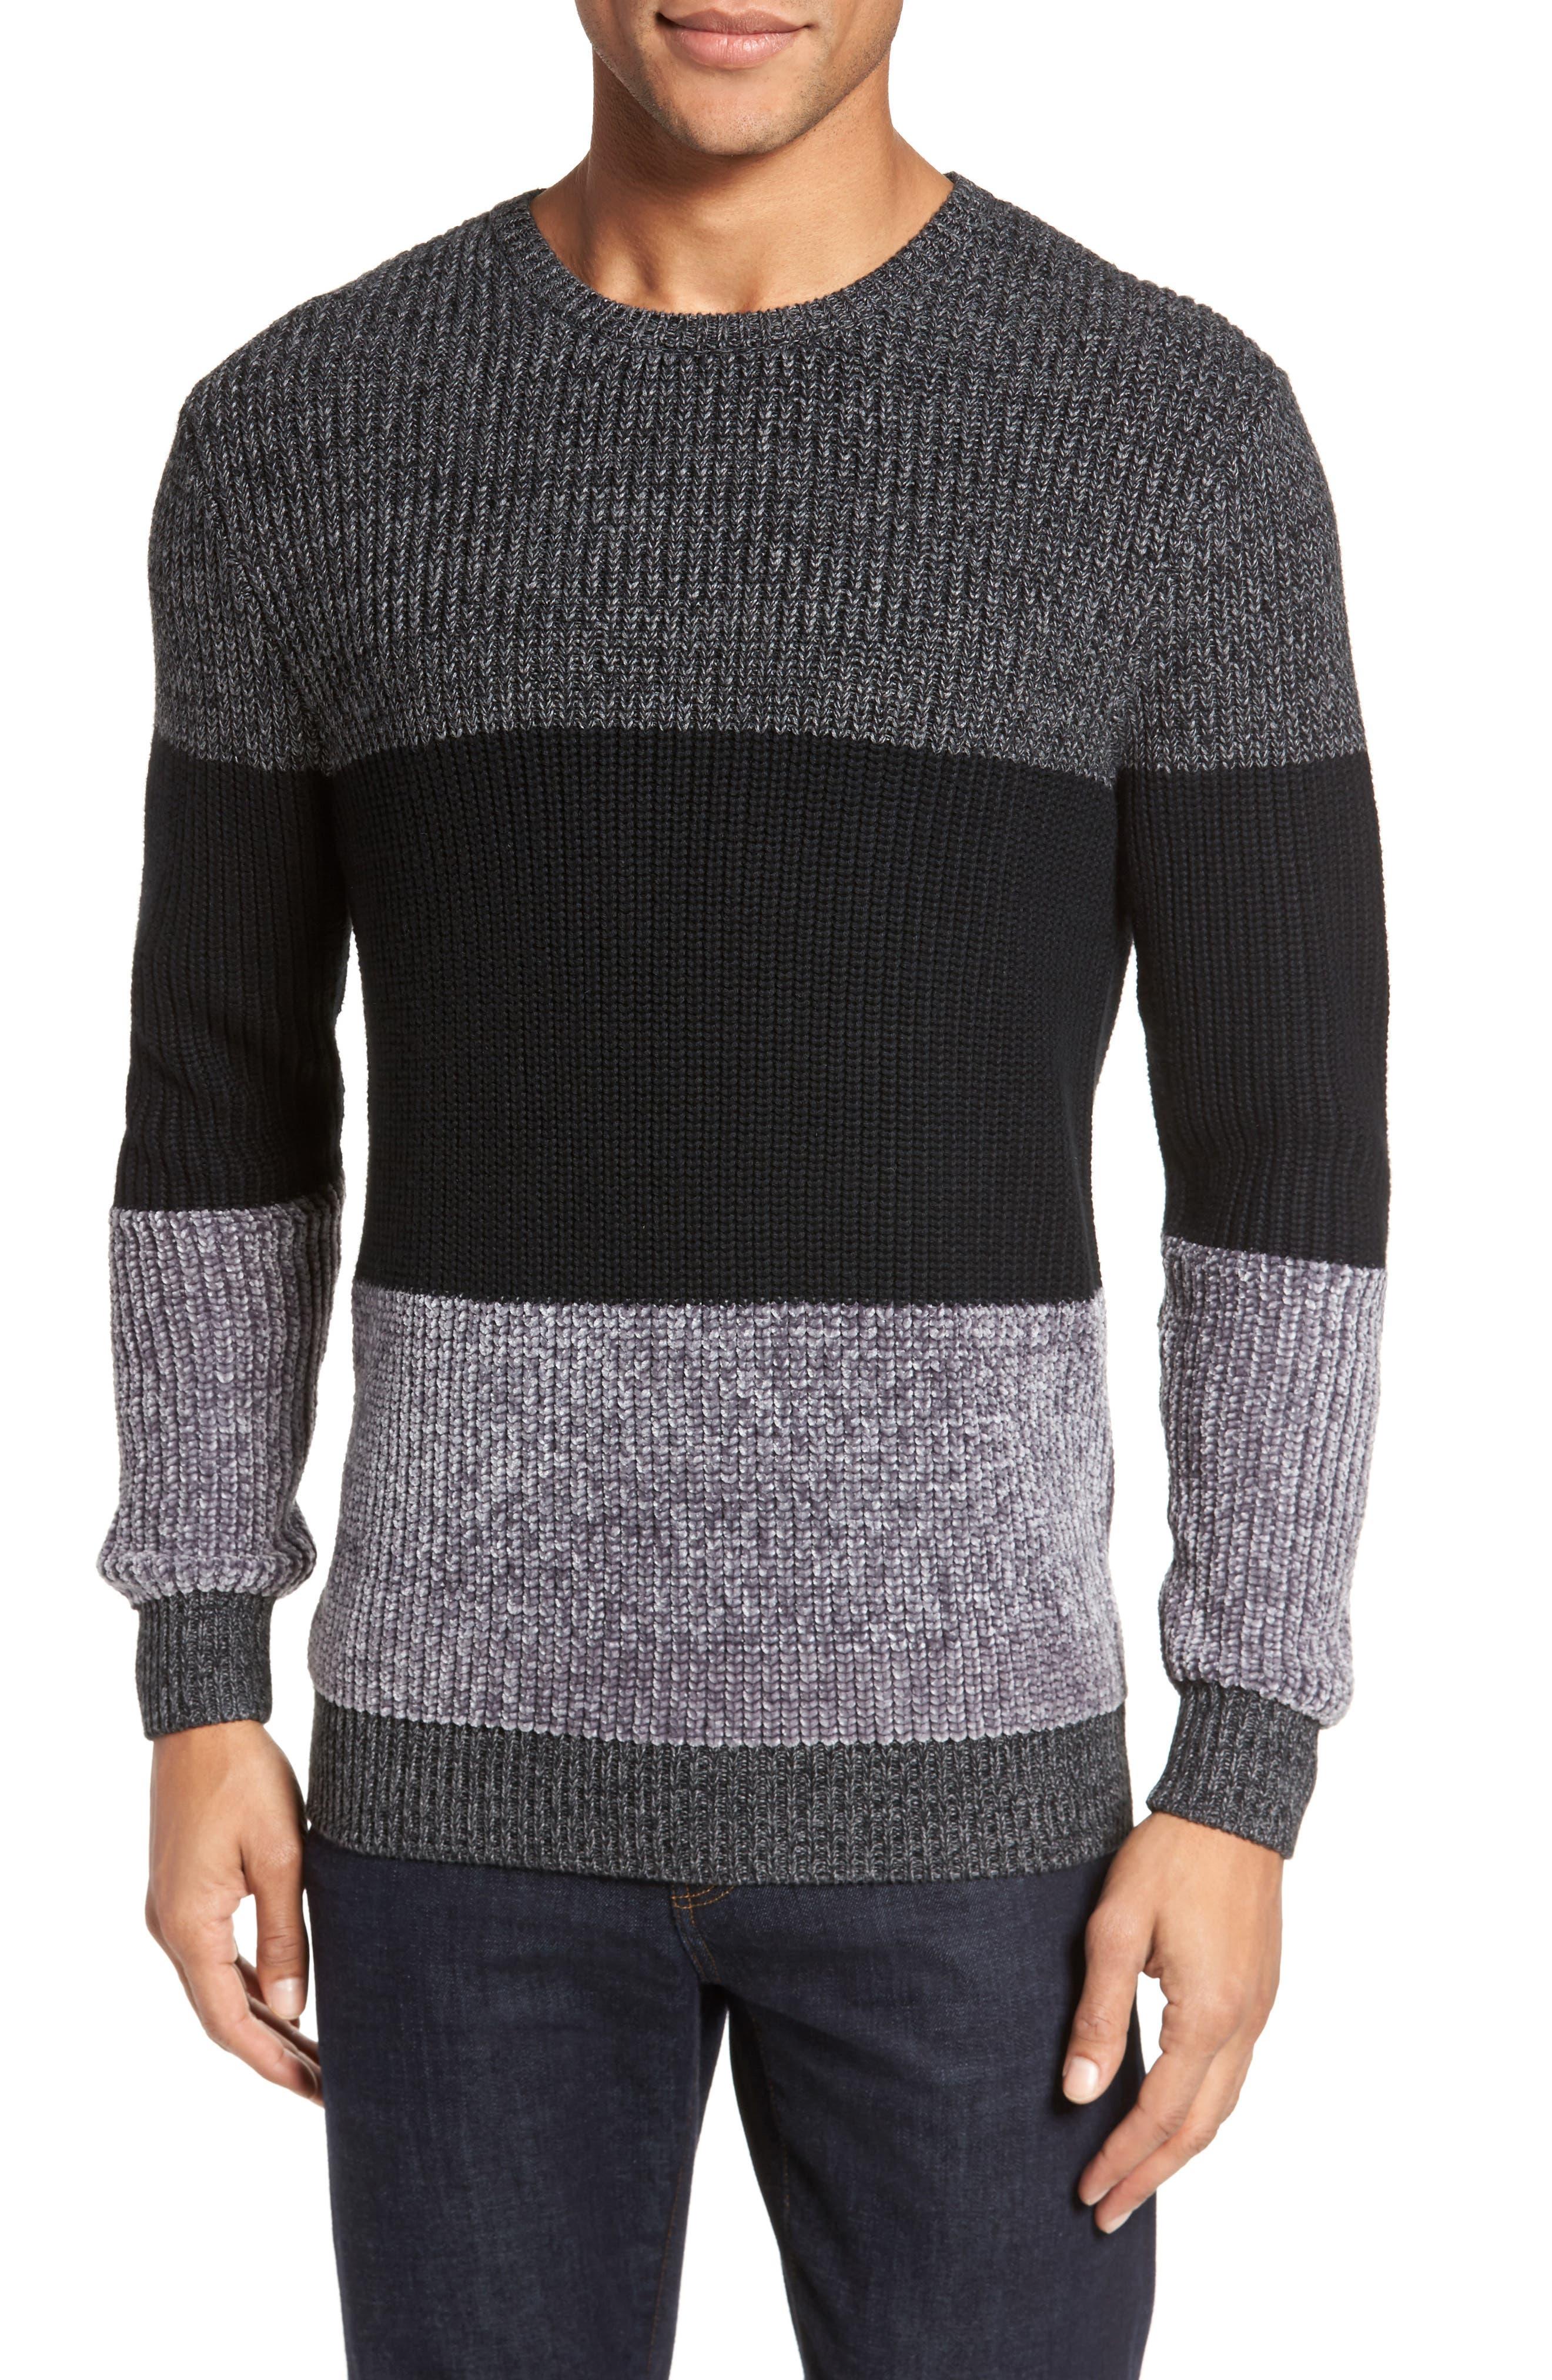 Vince Camuto Colorblock Chenille Sweater